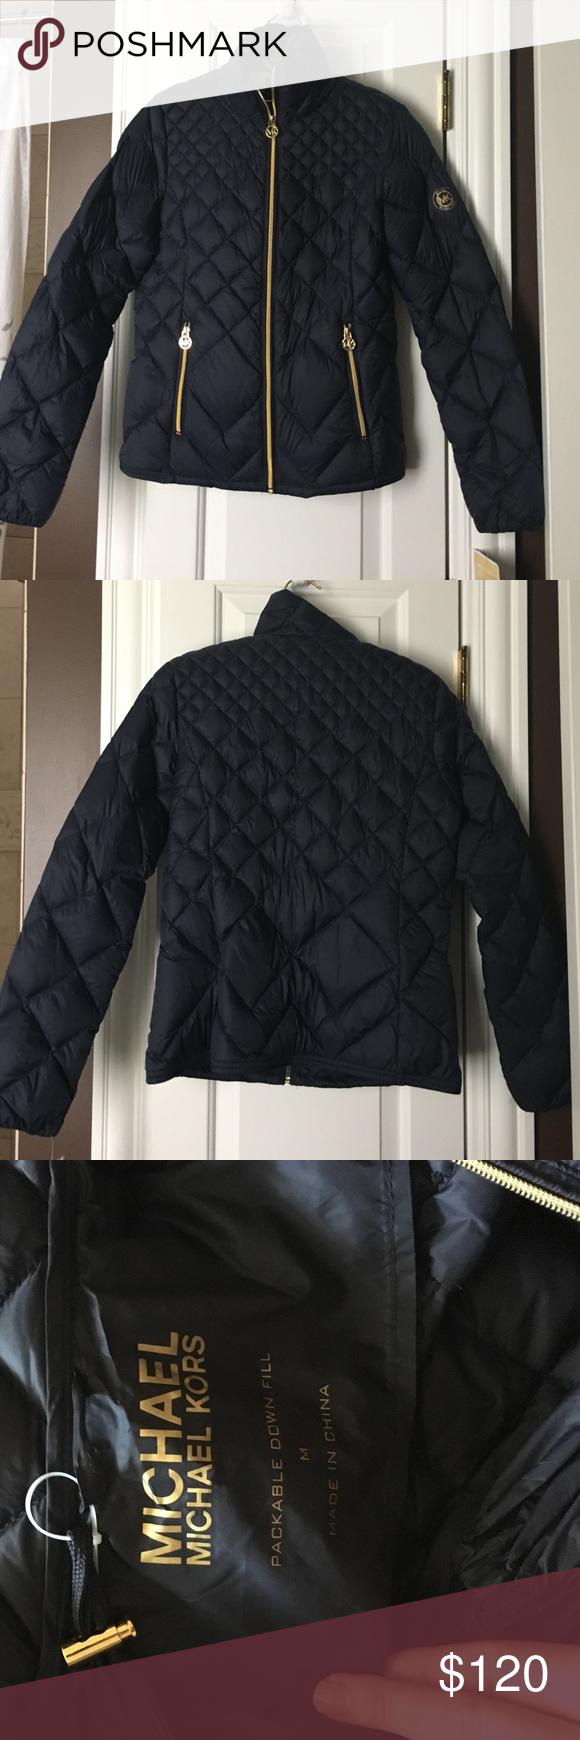 Brand New Authentic Michael Kors Jacket Michael Kors Jackets Clothes Design Fashion [ 1740 x 580 Pixel ]